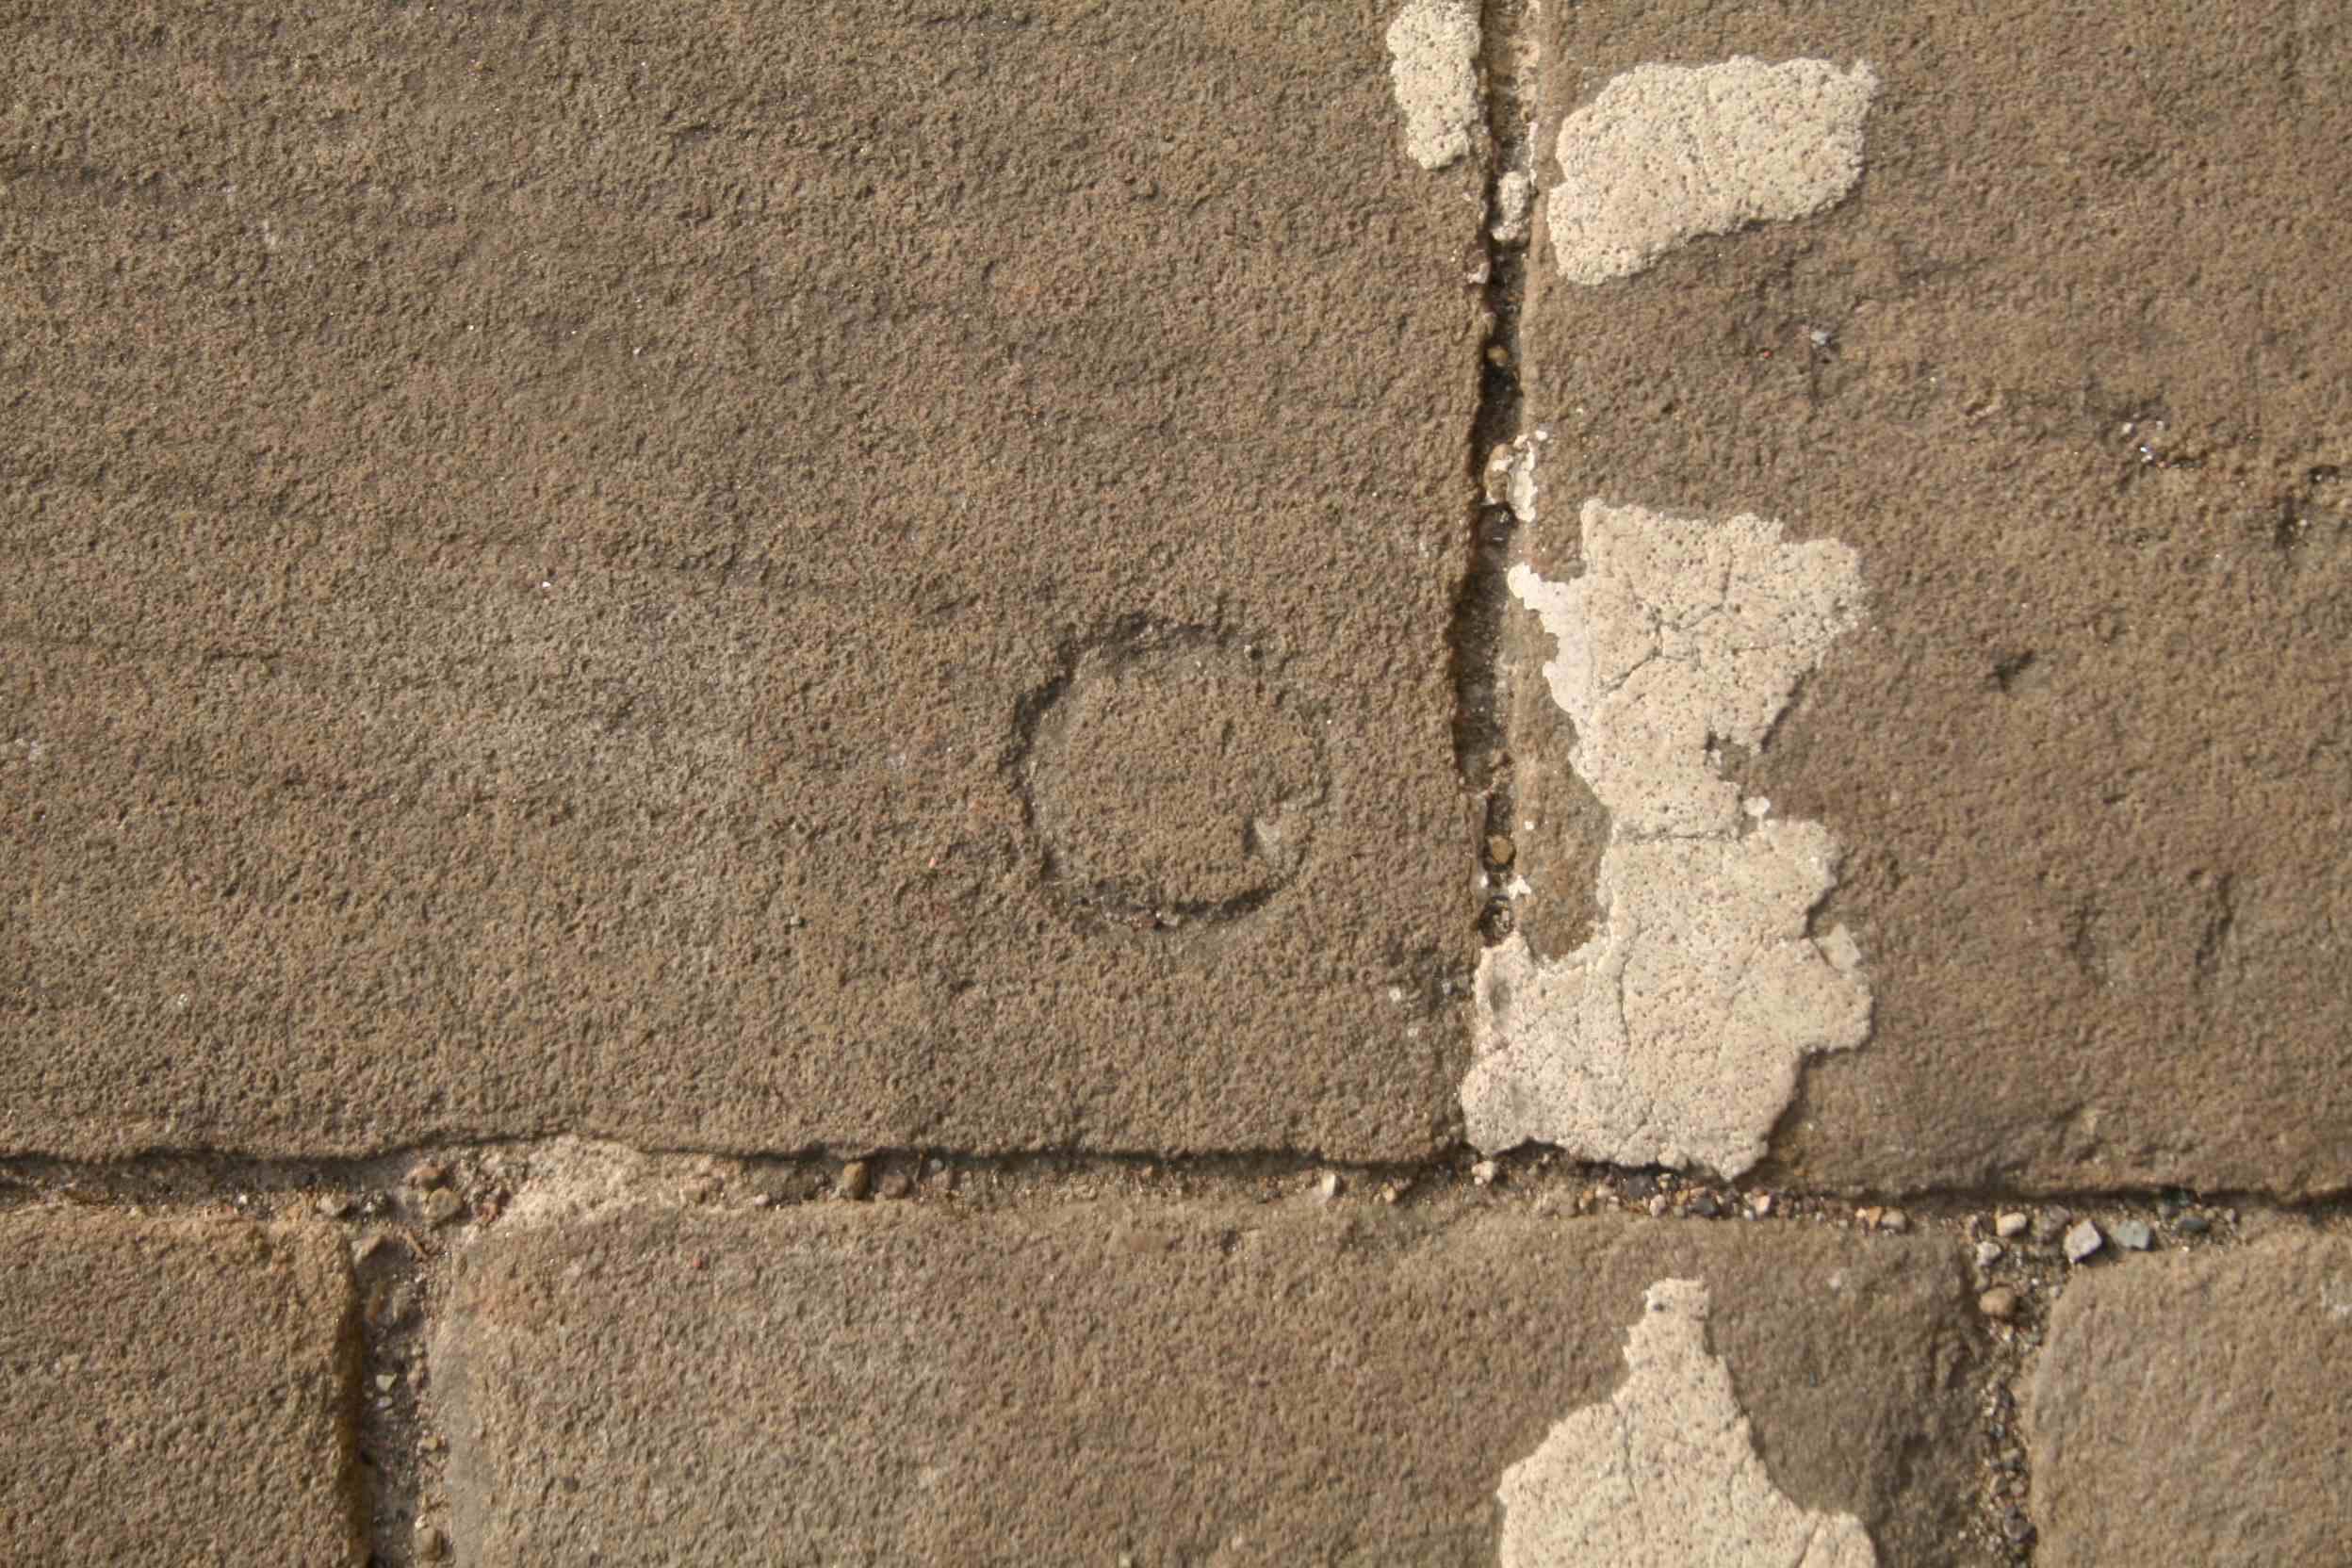 Alice Fox pavement marks 18